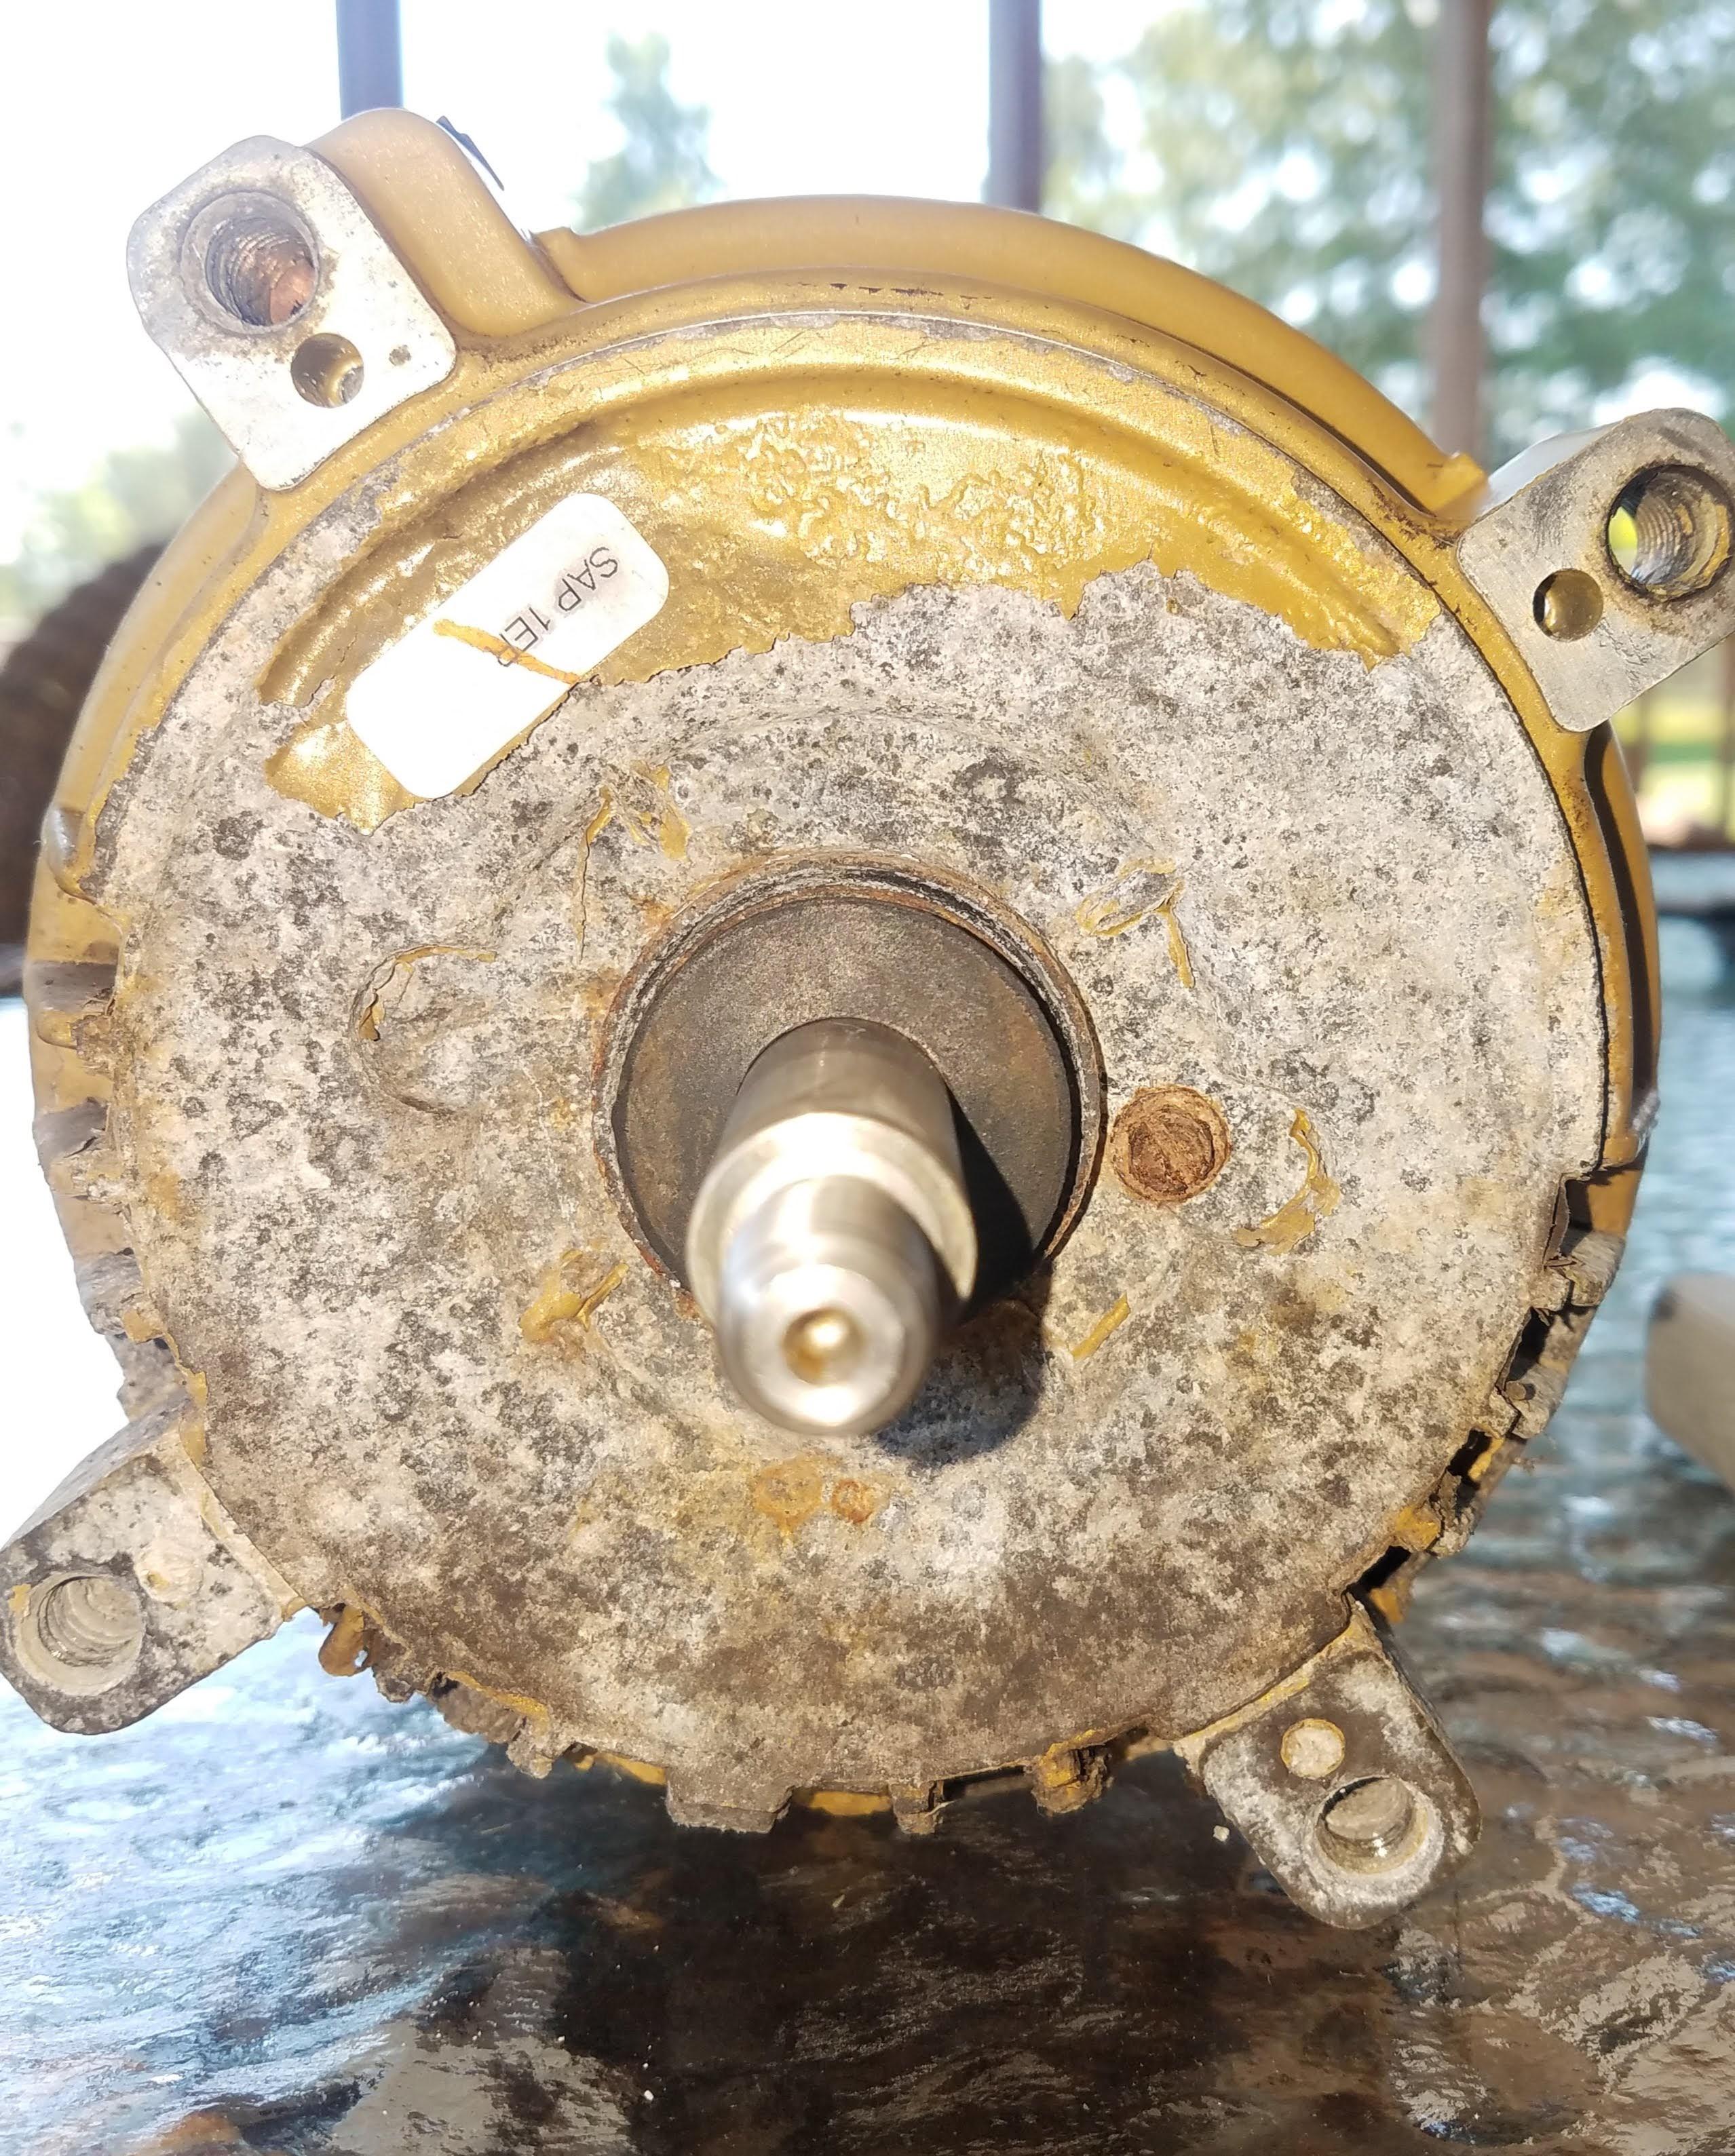 Hayward Super Pump motor rusted